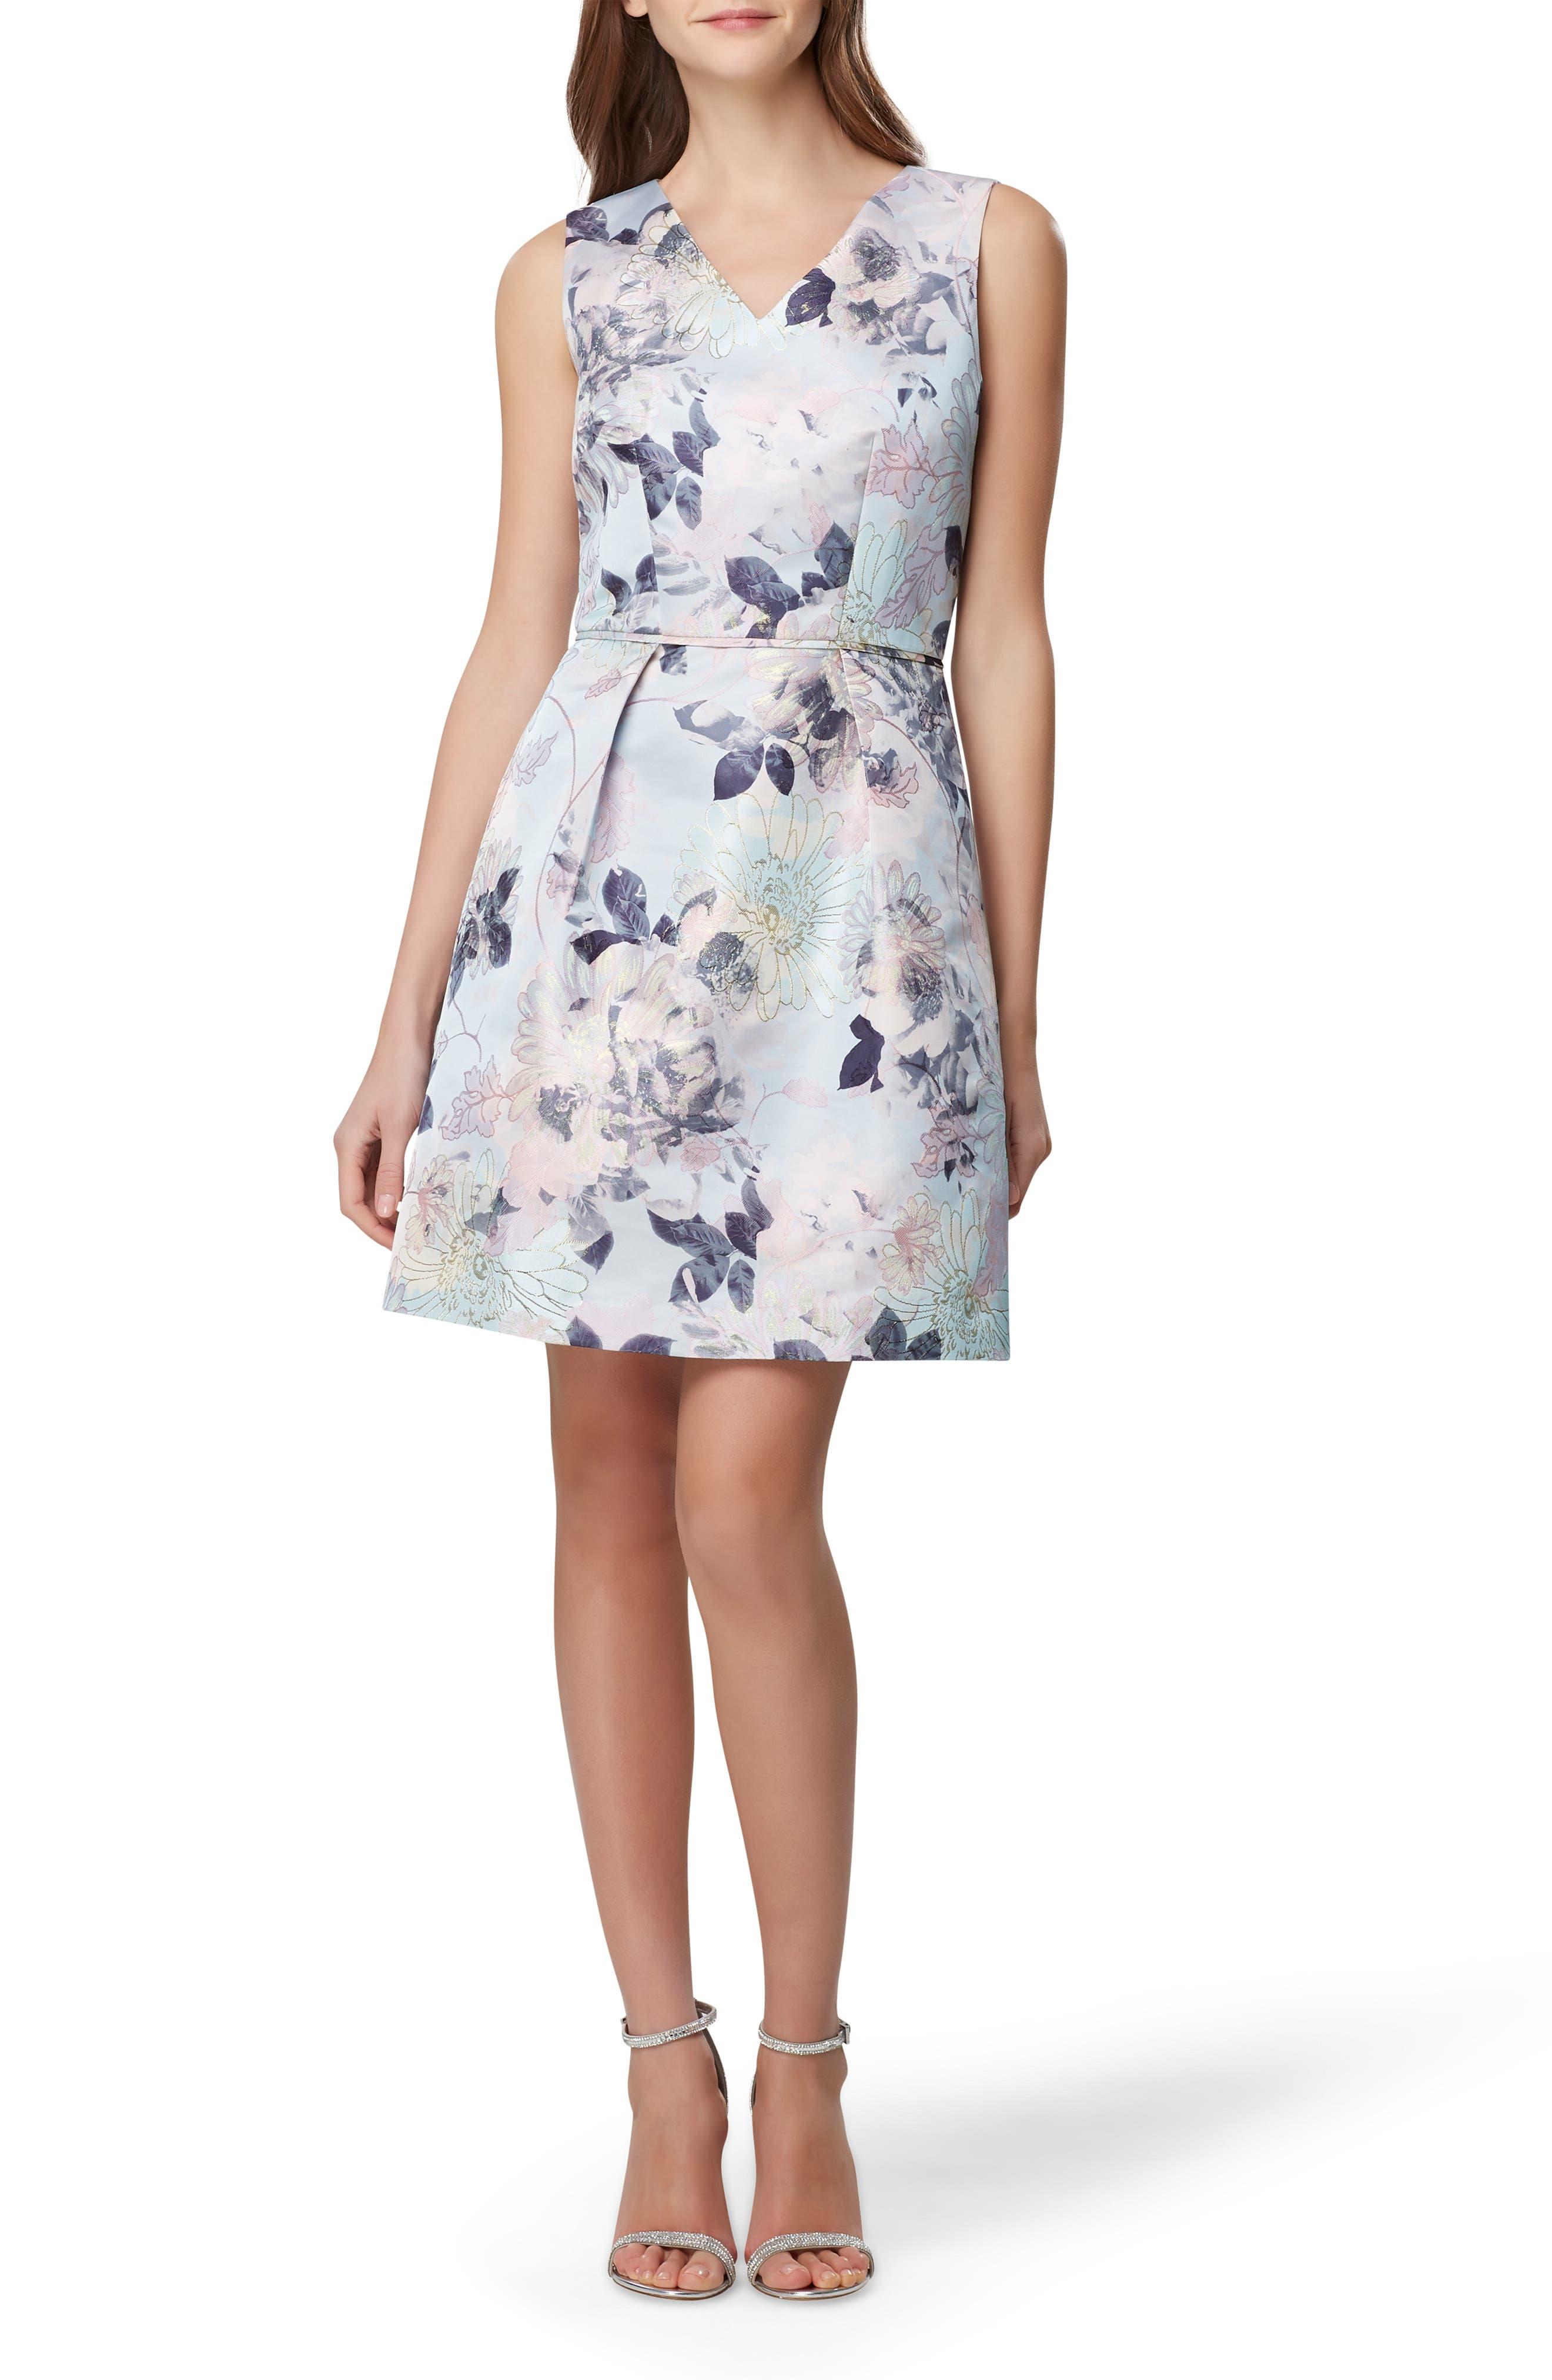 Tahari Dresses Sleeveless Floral Jacquard Fit & Flare Dress